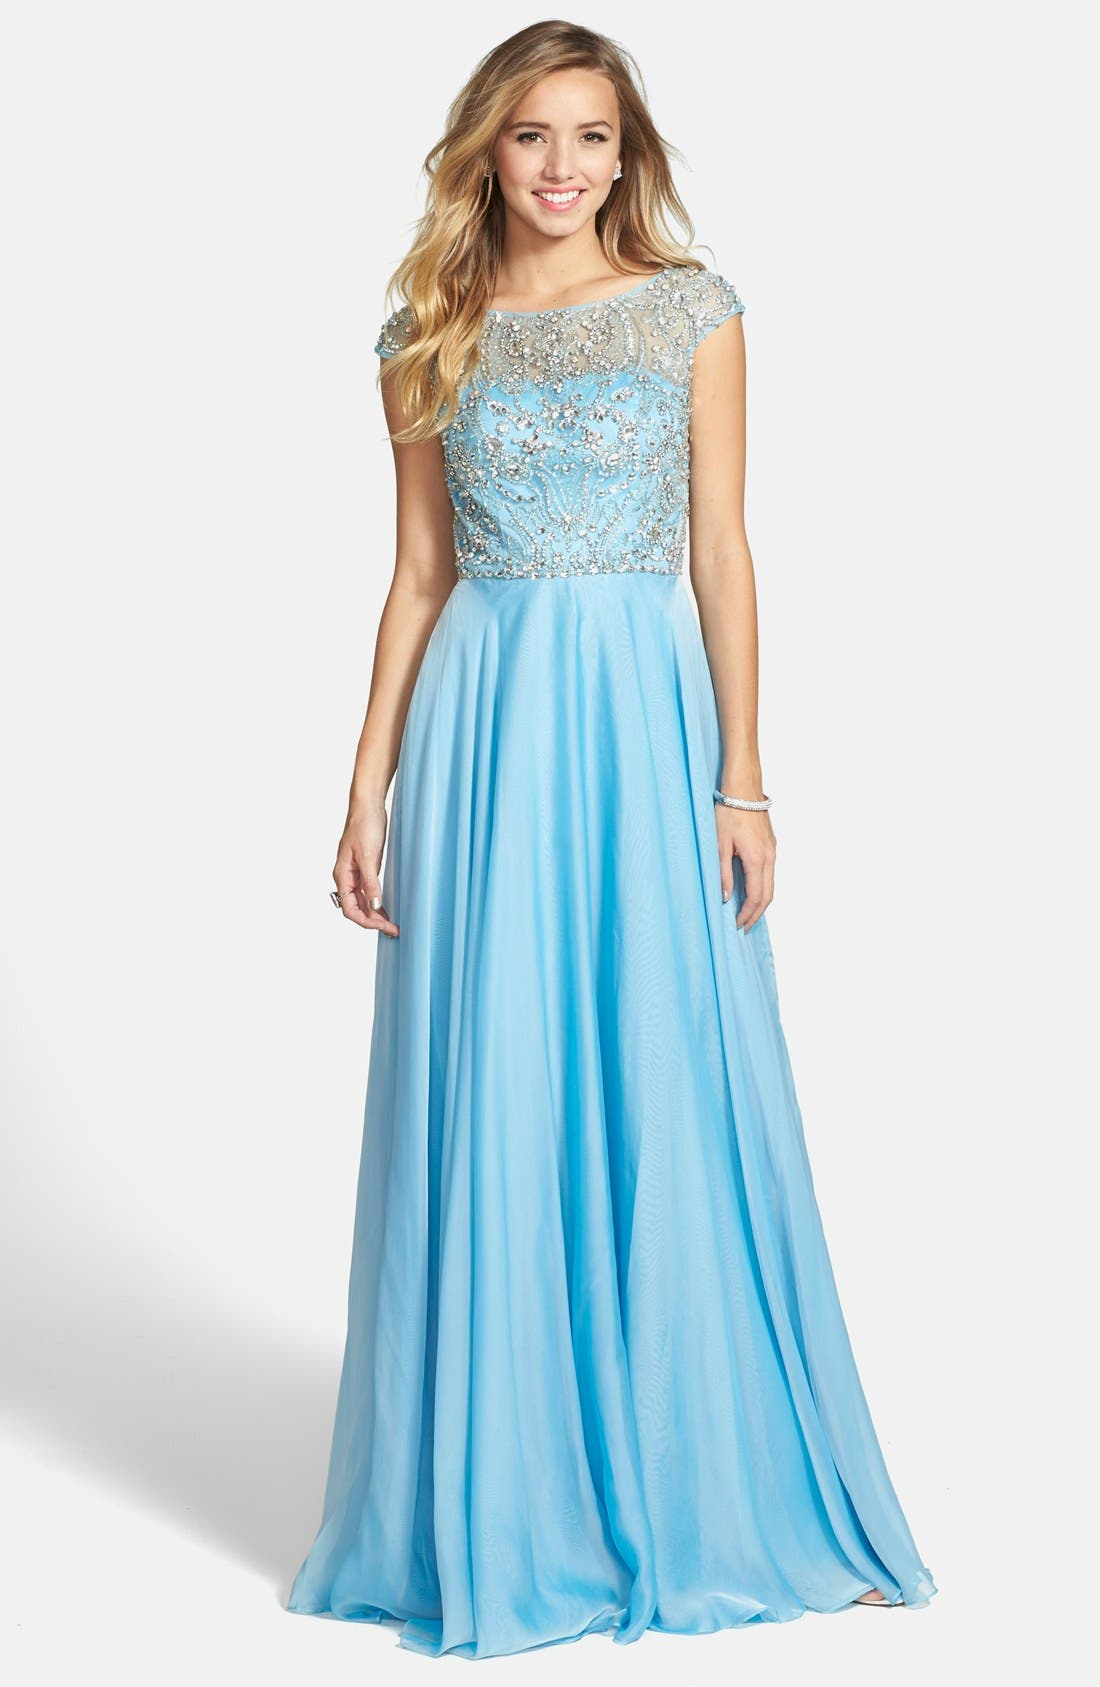 Main Image - Sherri Hill Embellished Illusion Bodice Gown